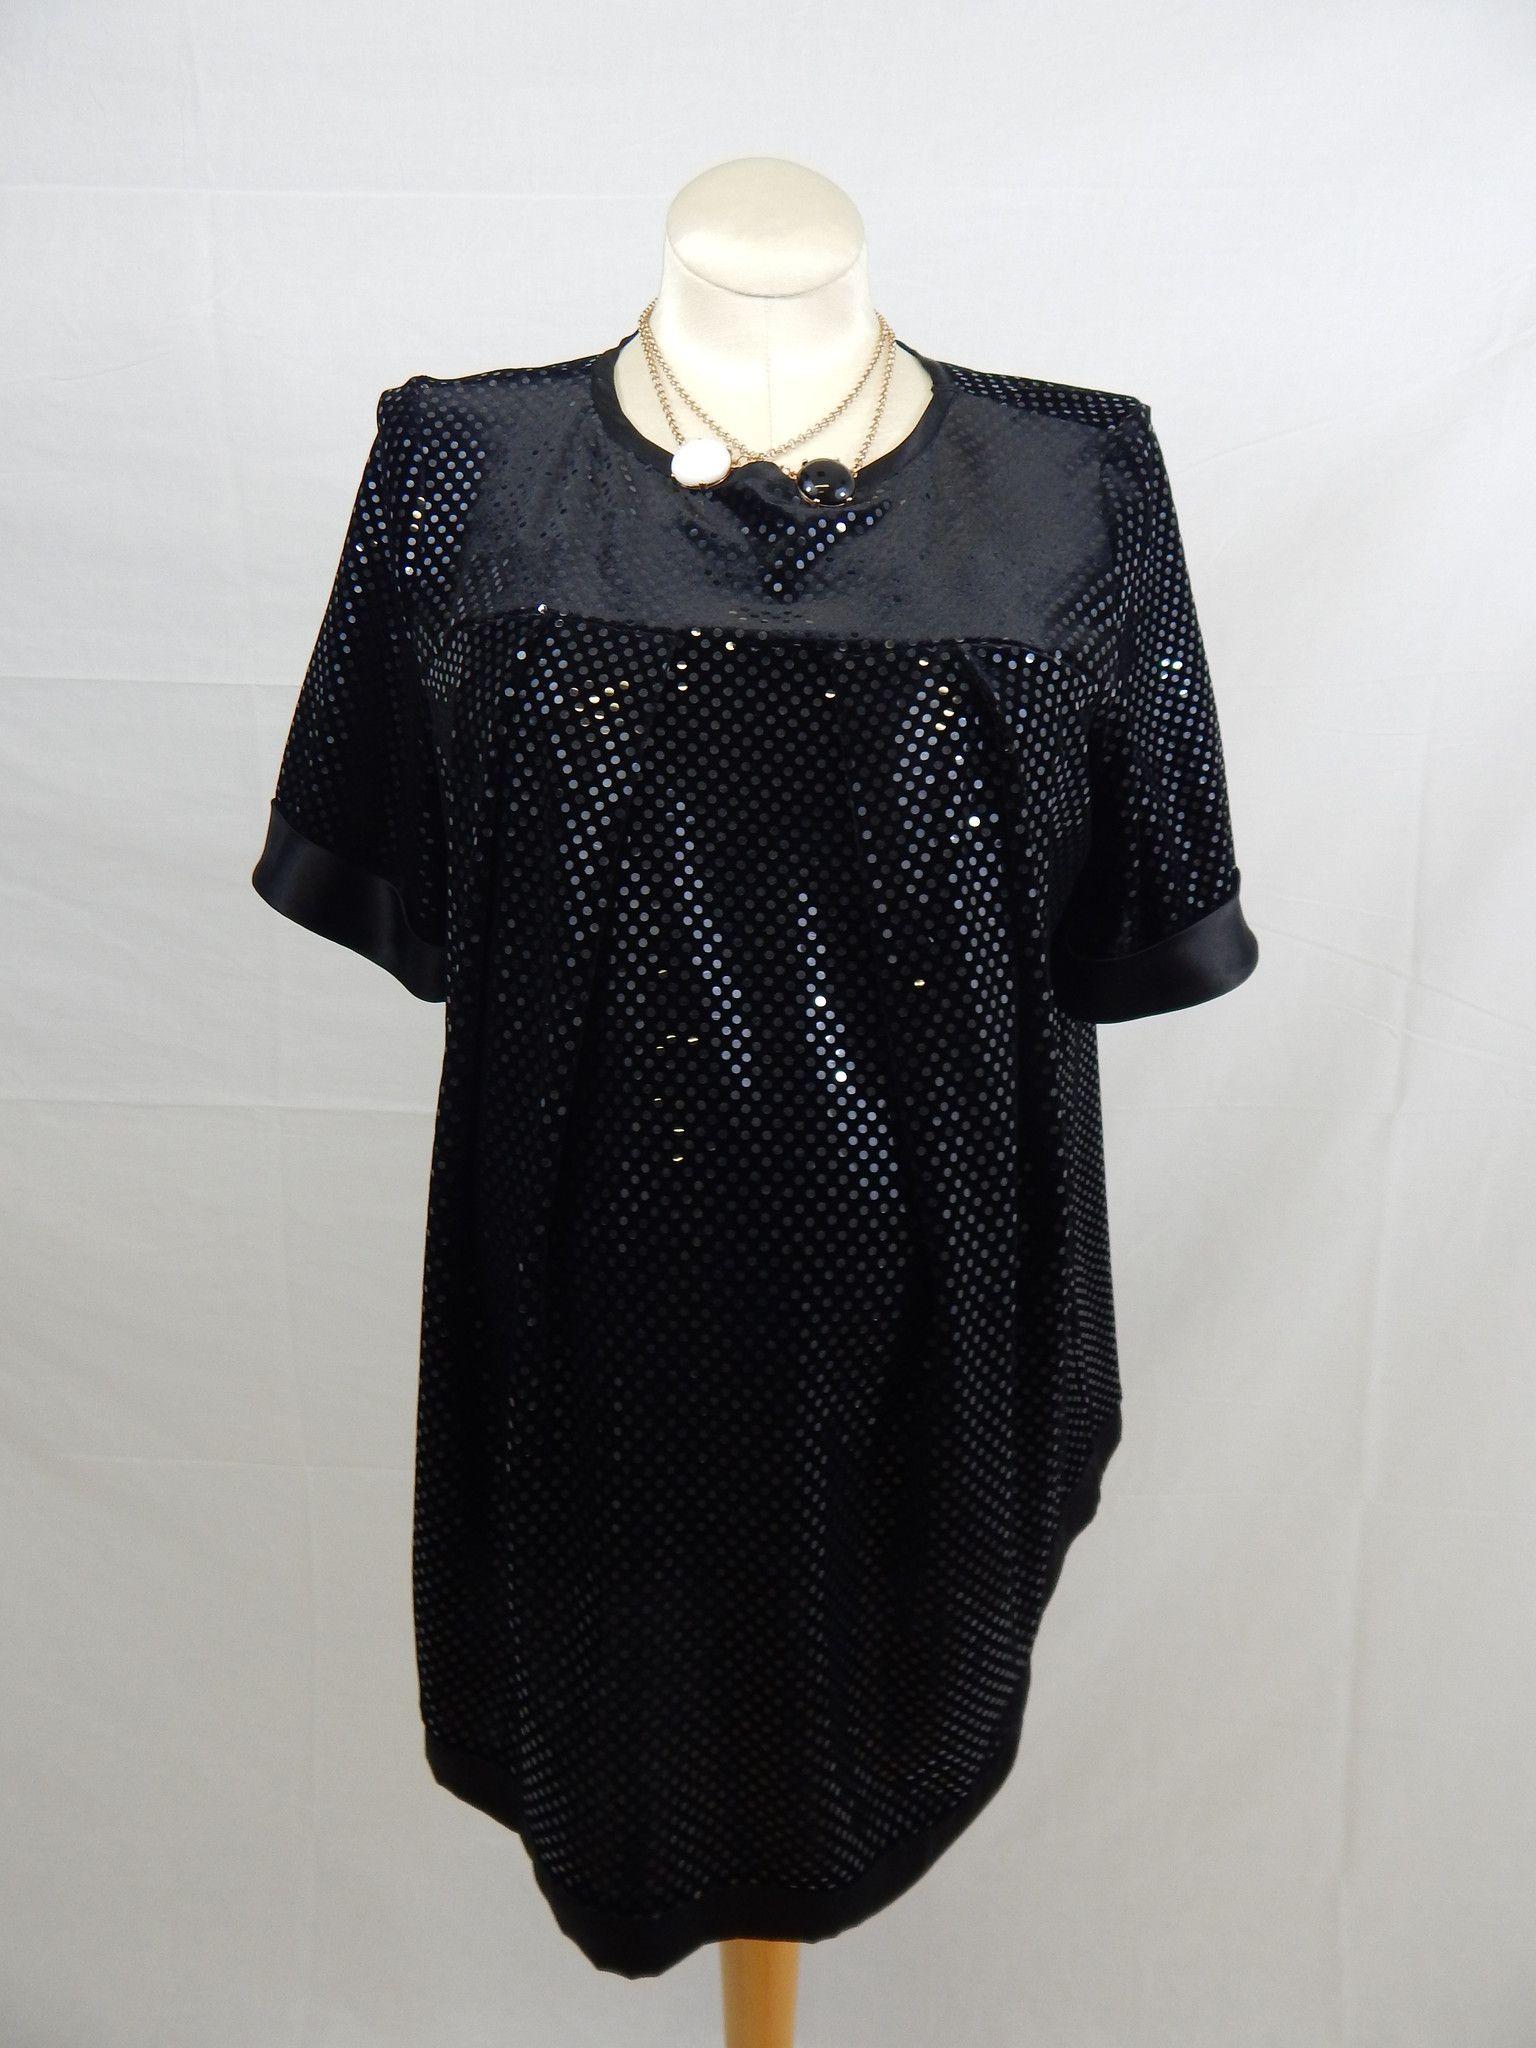 Black & White Floral Satin Short Sleeve Blouse-Large